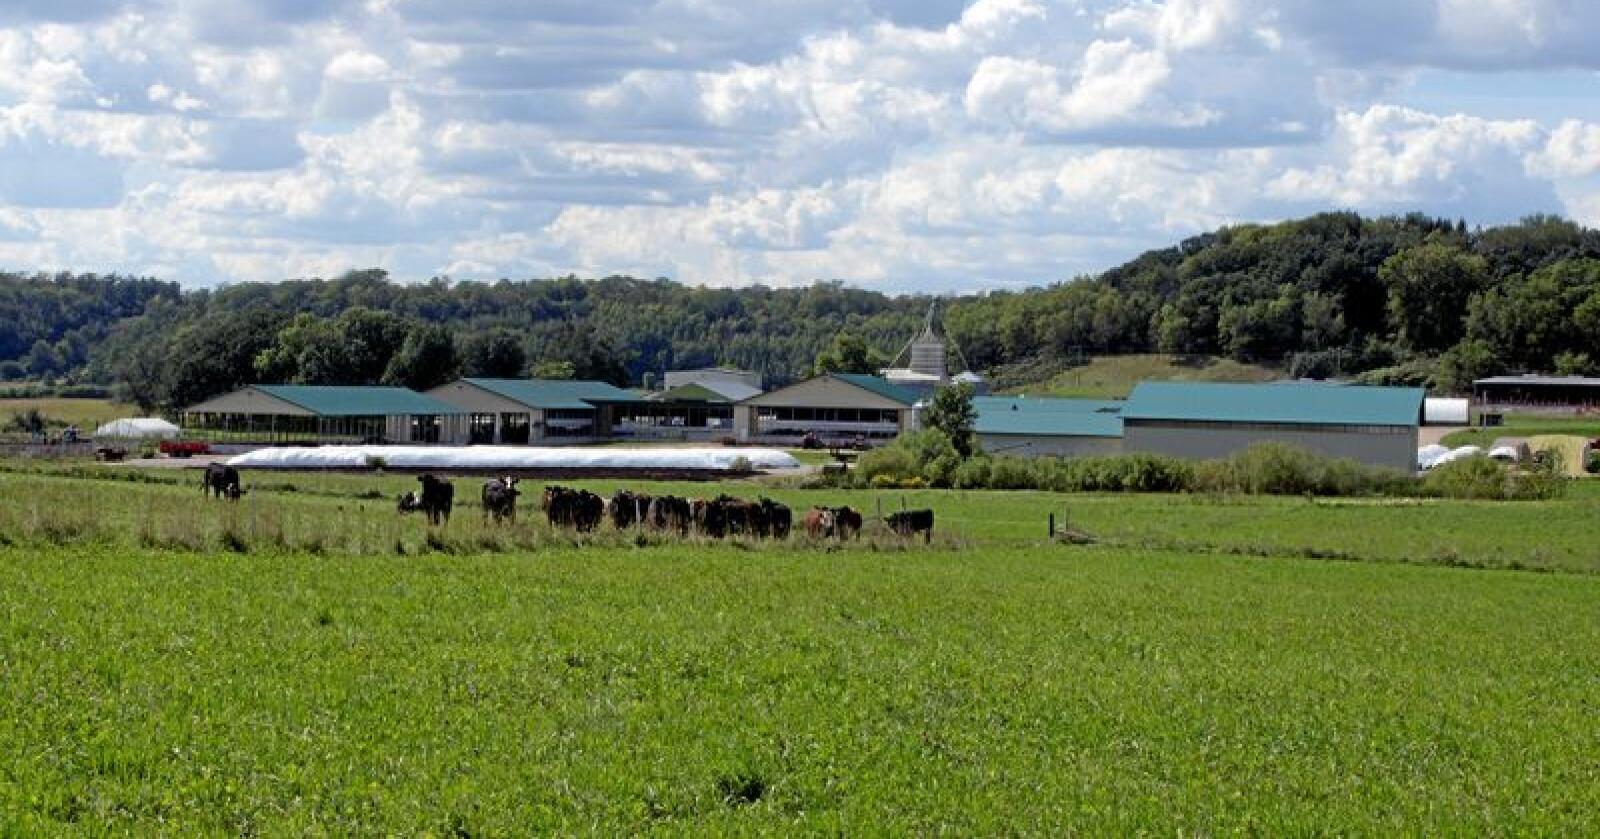 Eit stort mjølkebruk i vestre Wisconsin. Foto: Paul Jantz Mostphotos